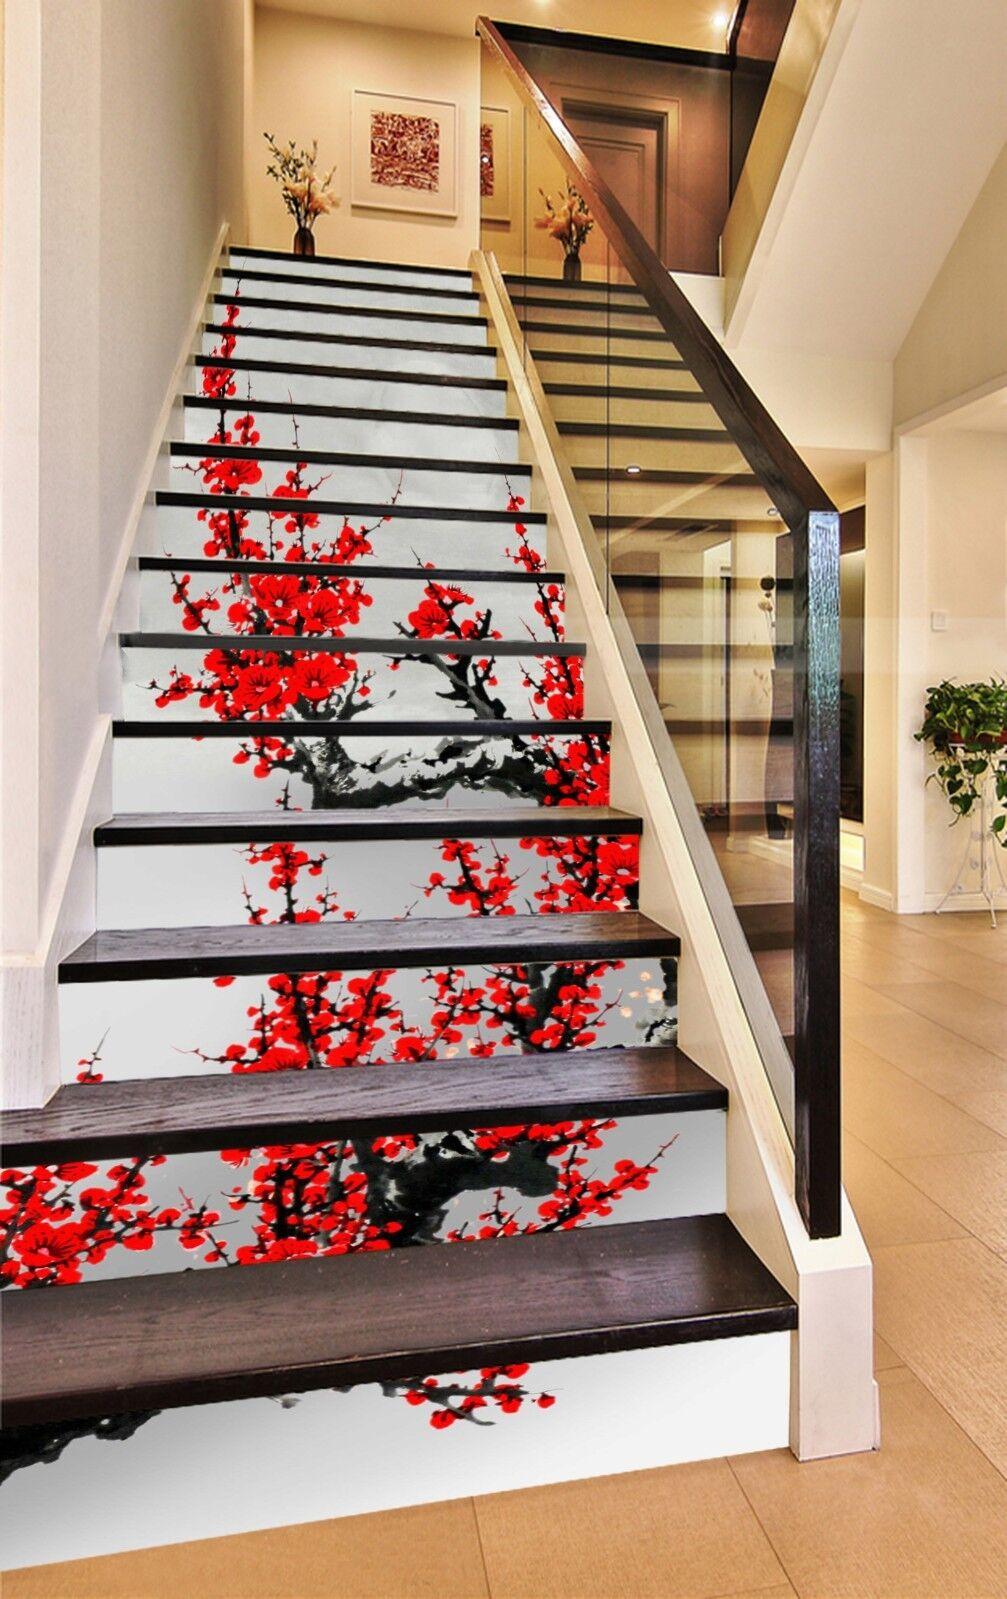 3D  rouge plum blossom 233 Risers Decoration Photo Mural Vinyl Decal Wallpaper US